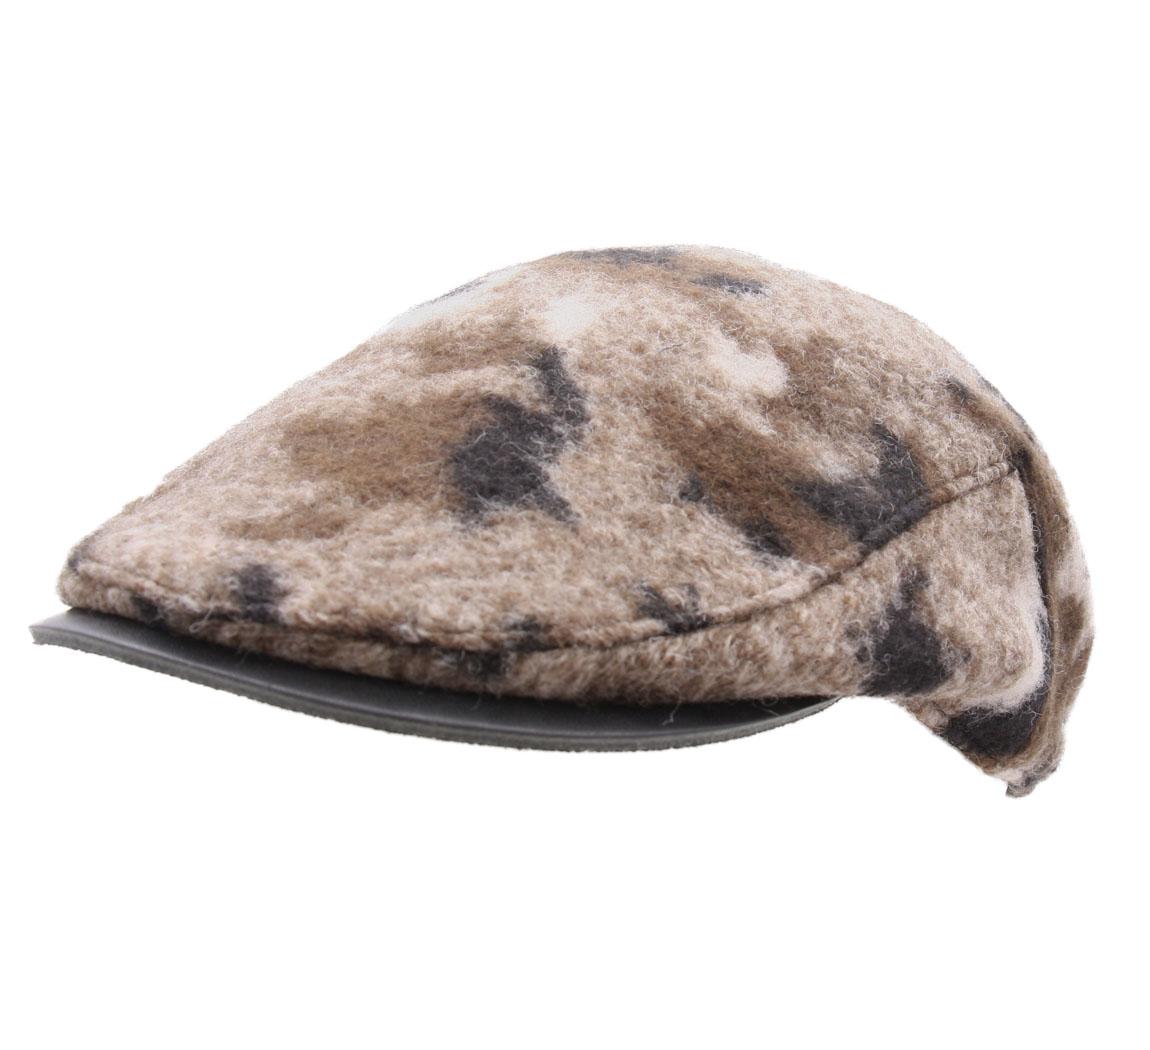 acheter en ligne 58167 a0901 HOGAN - Caps Bailey